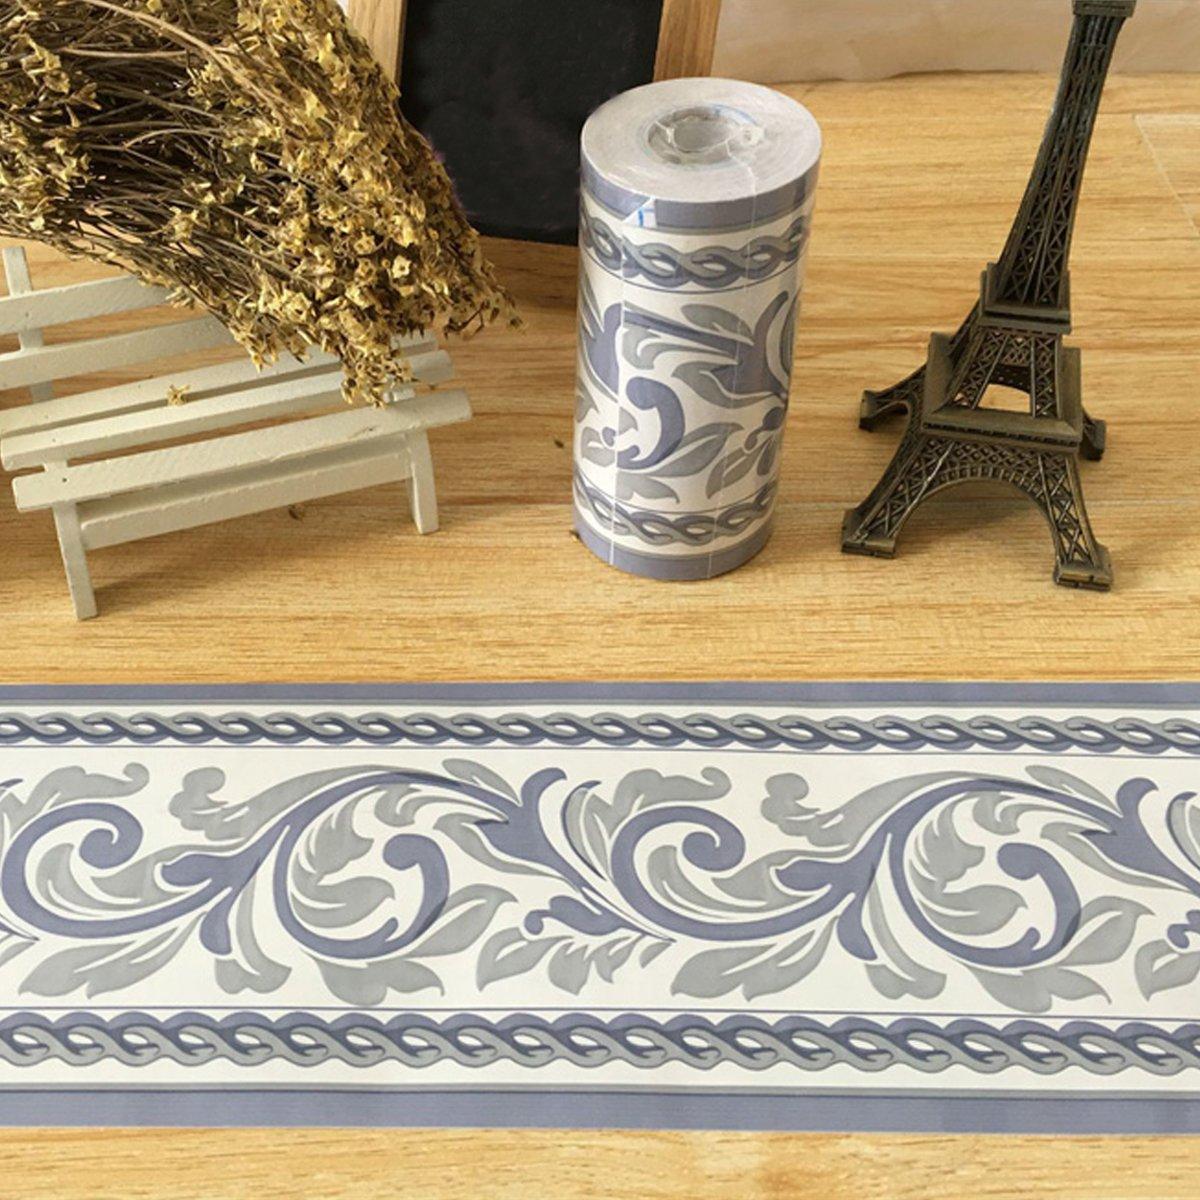 SimpleLife4U Moistureproof PVC Wallpaper Border Peel & Stick Scroll Wall Borders Sticker Home Decor